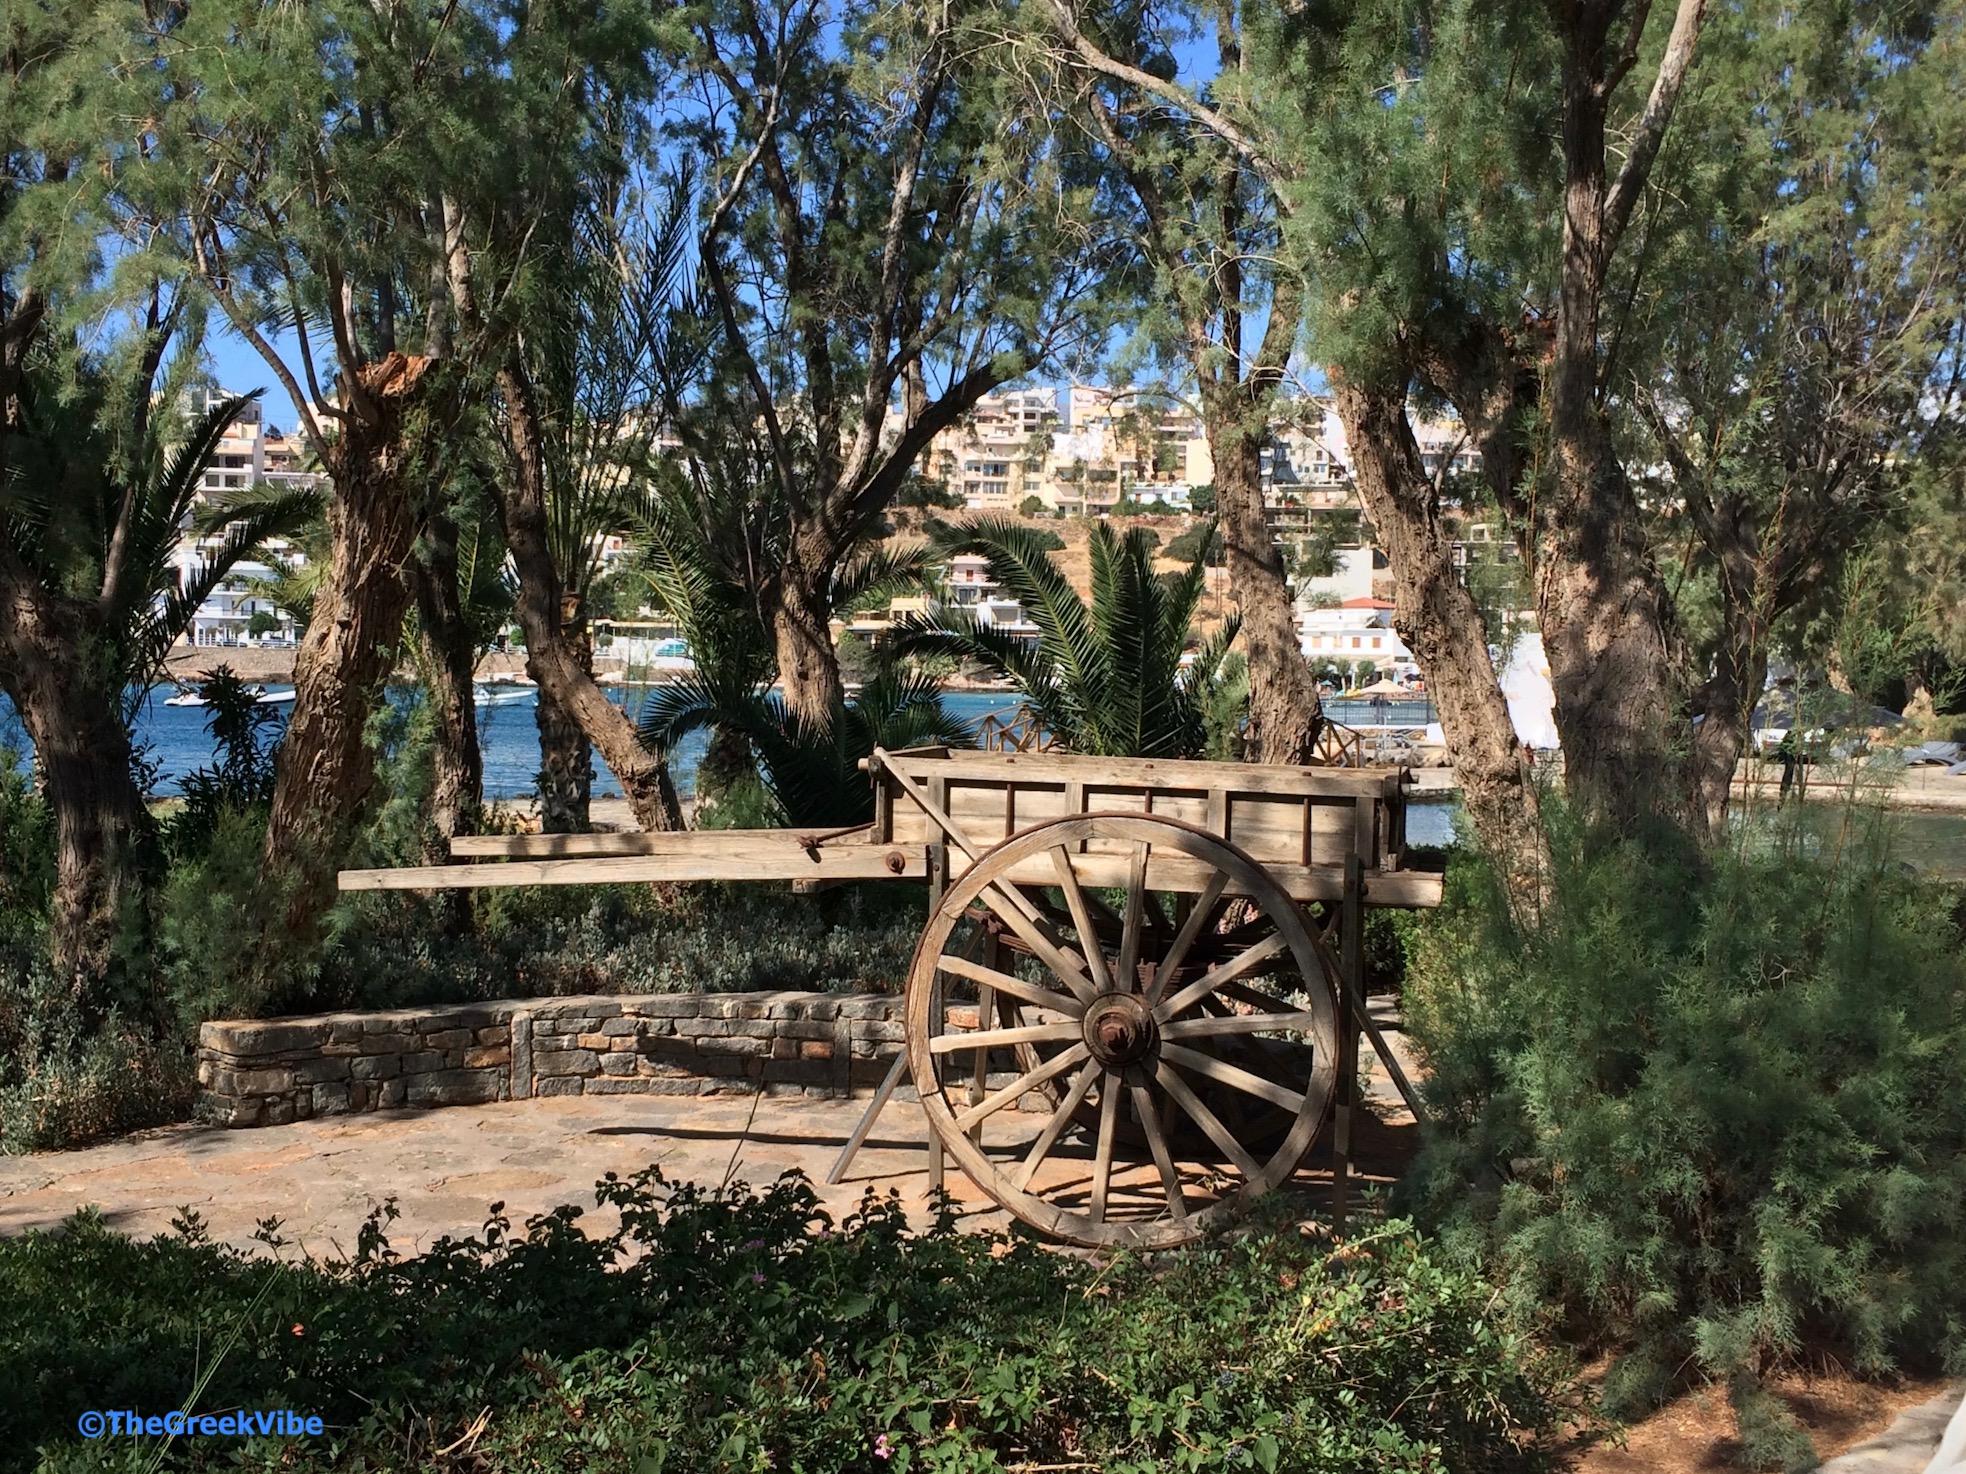 Ecoweek Crete: Tourism for a Greener Future